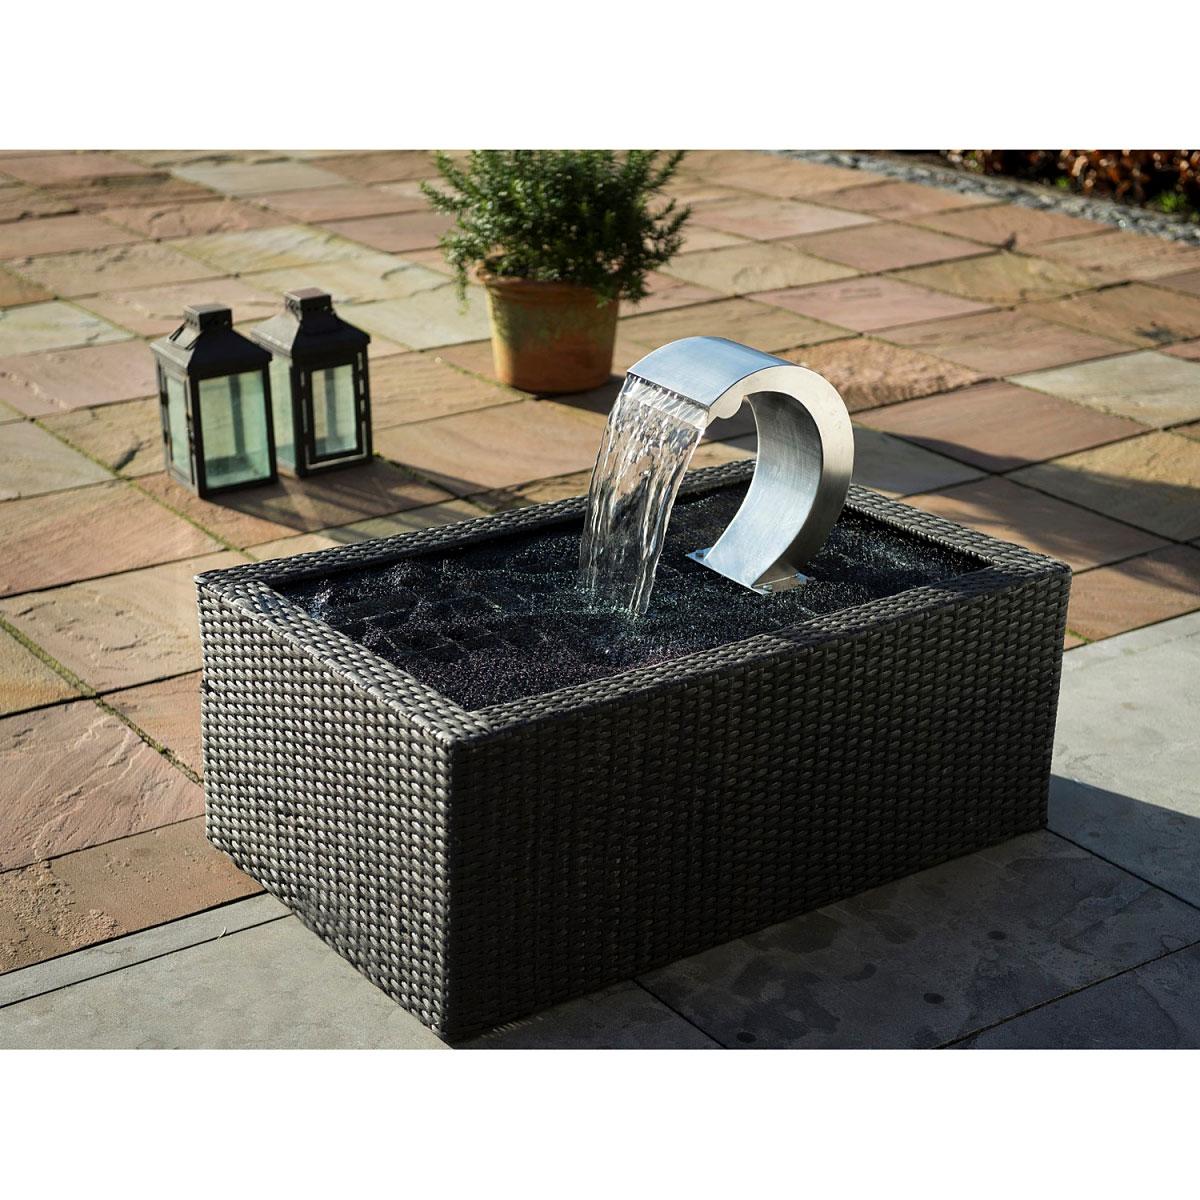 "Gartendekoration - Wasserfall Set ""Mamba"" inkl. LED Beleuchtung  - Onlineshop Hellweg"